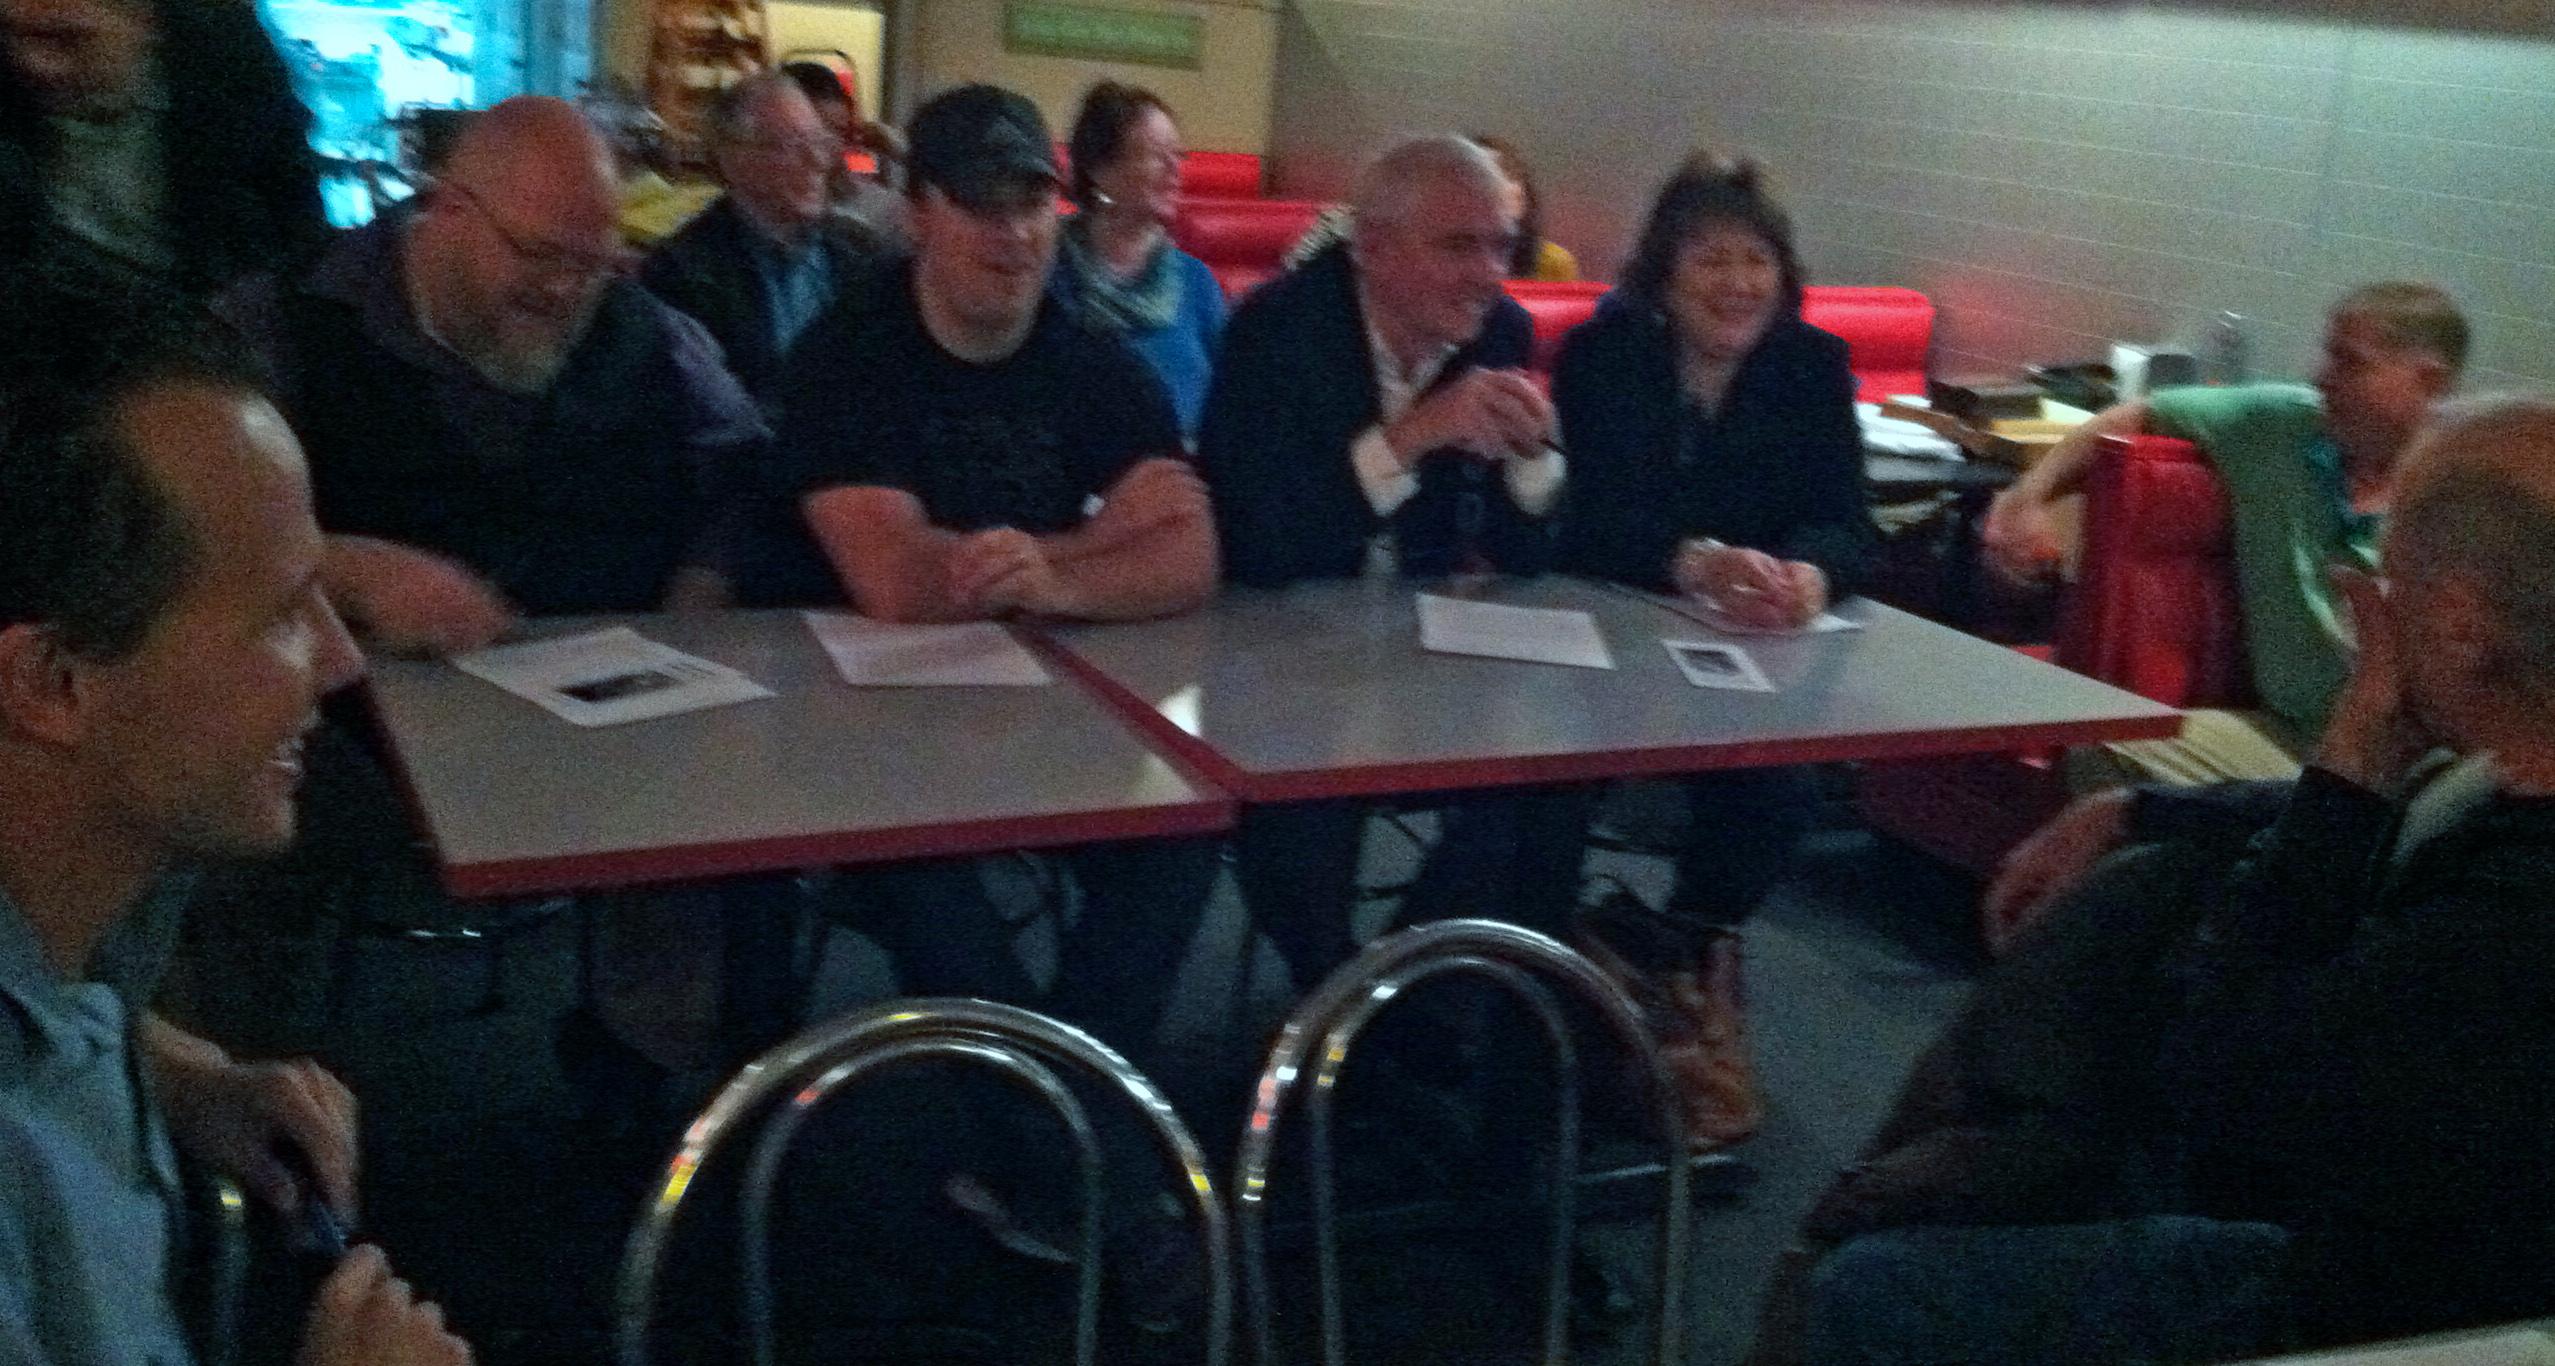 Gary Chesney attending entrepreneurial pitch night.